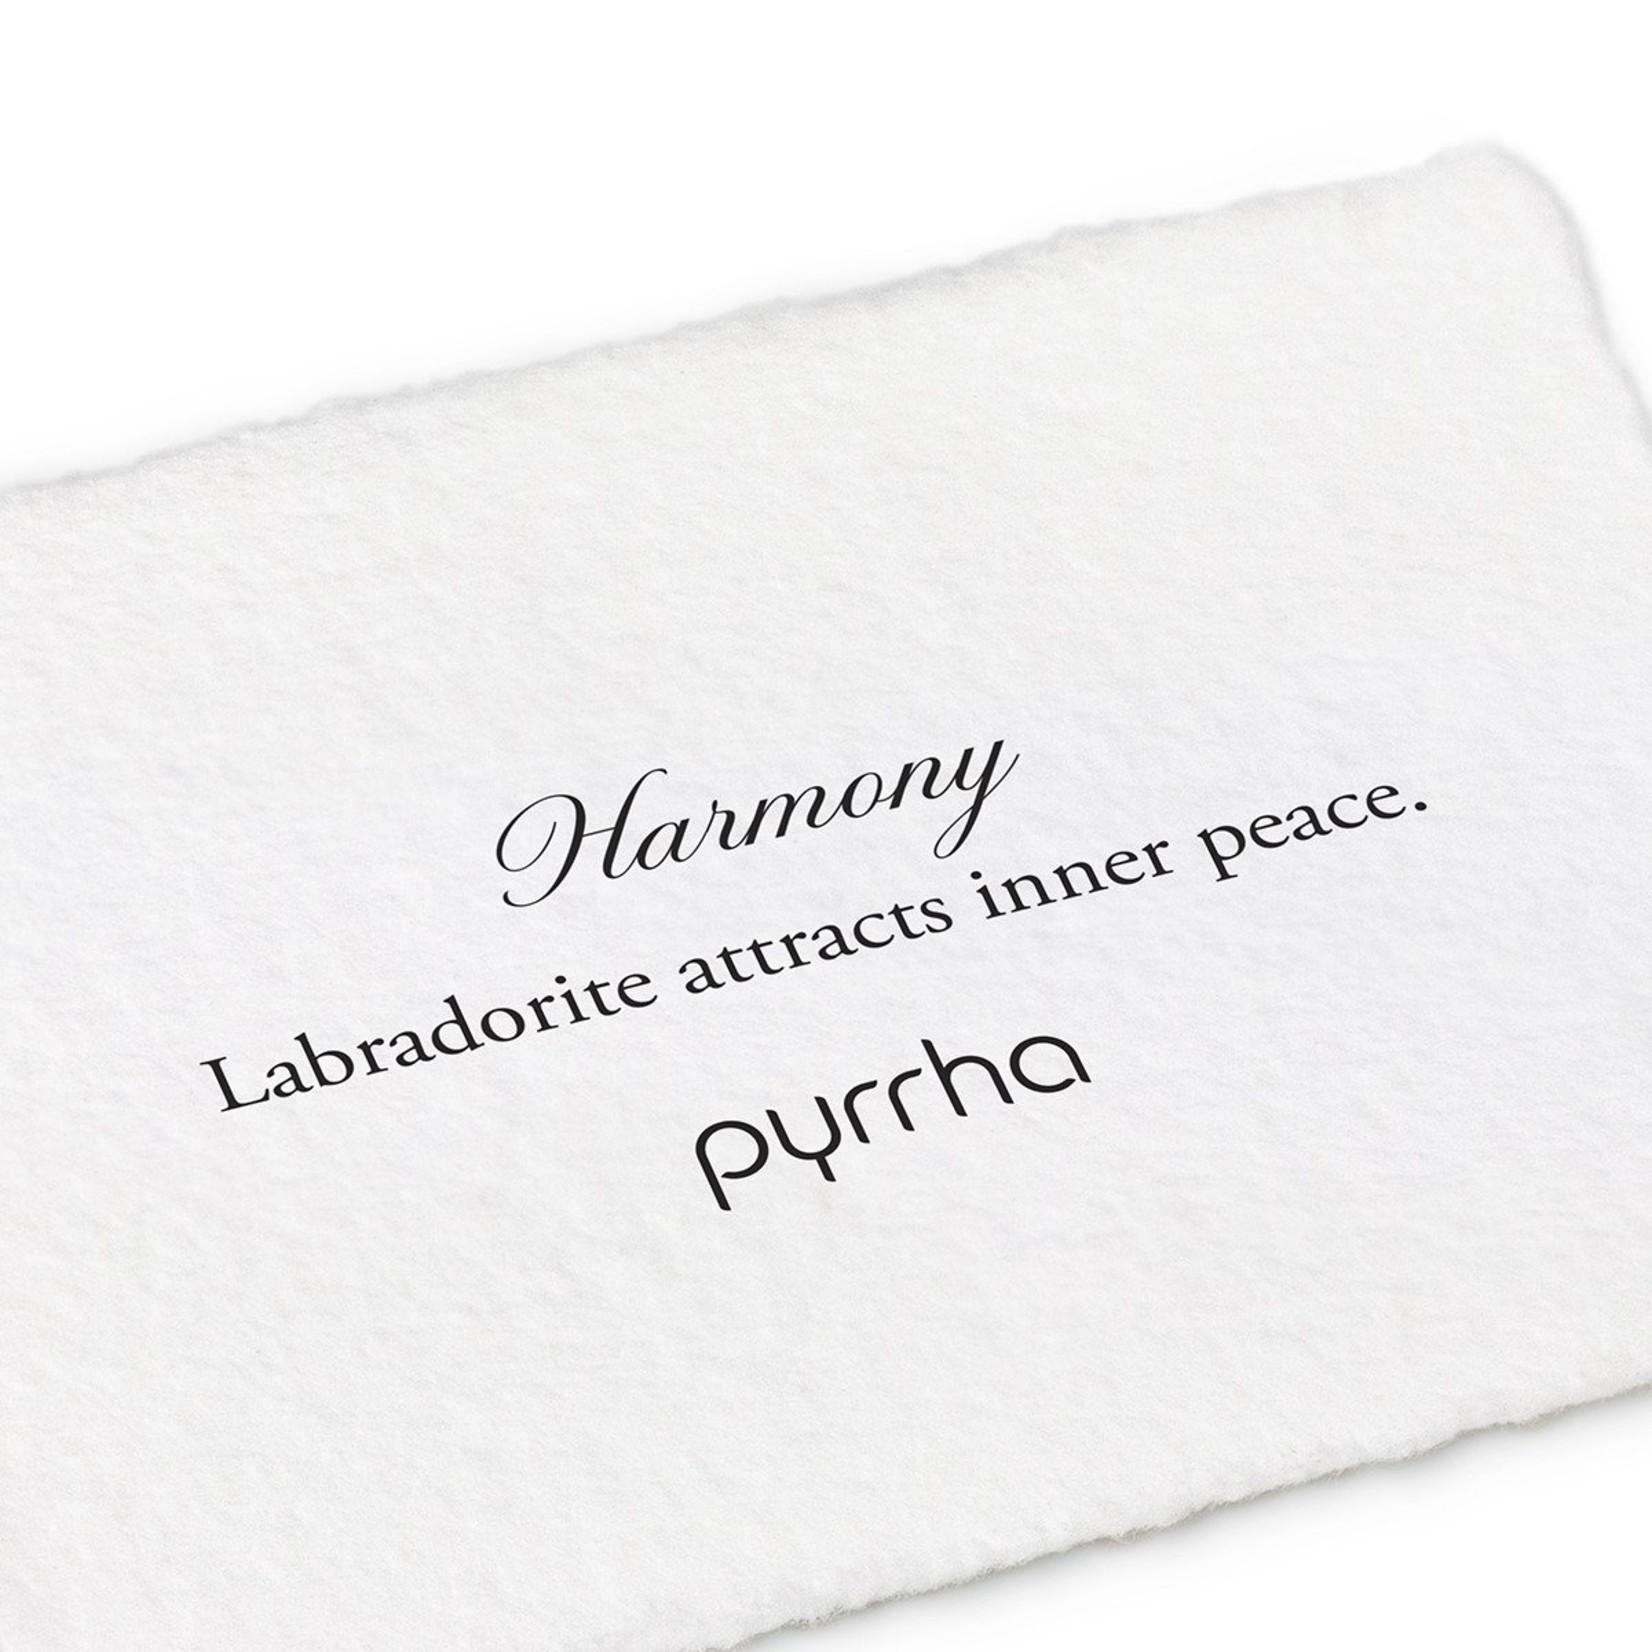 Pyrrha Harmony Signature Attraction Charm